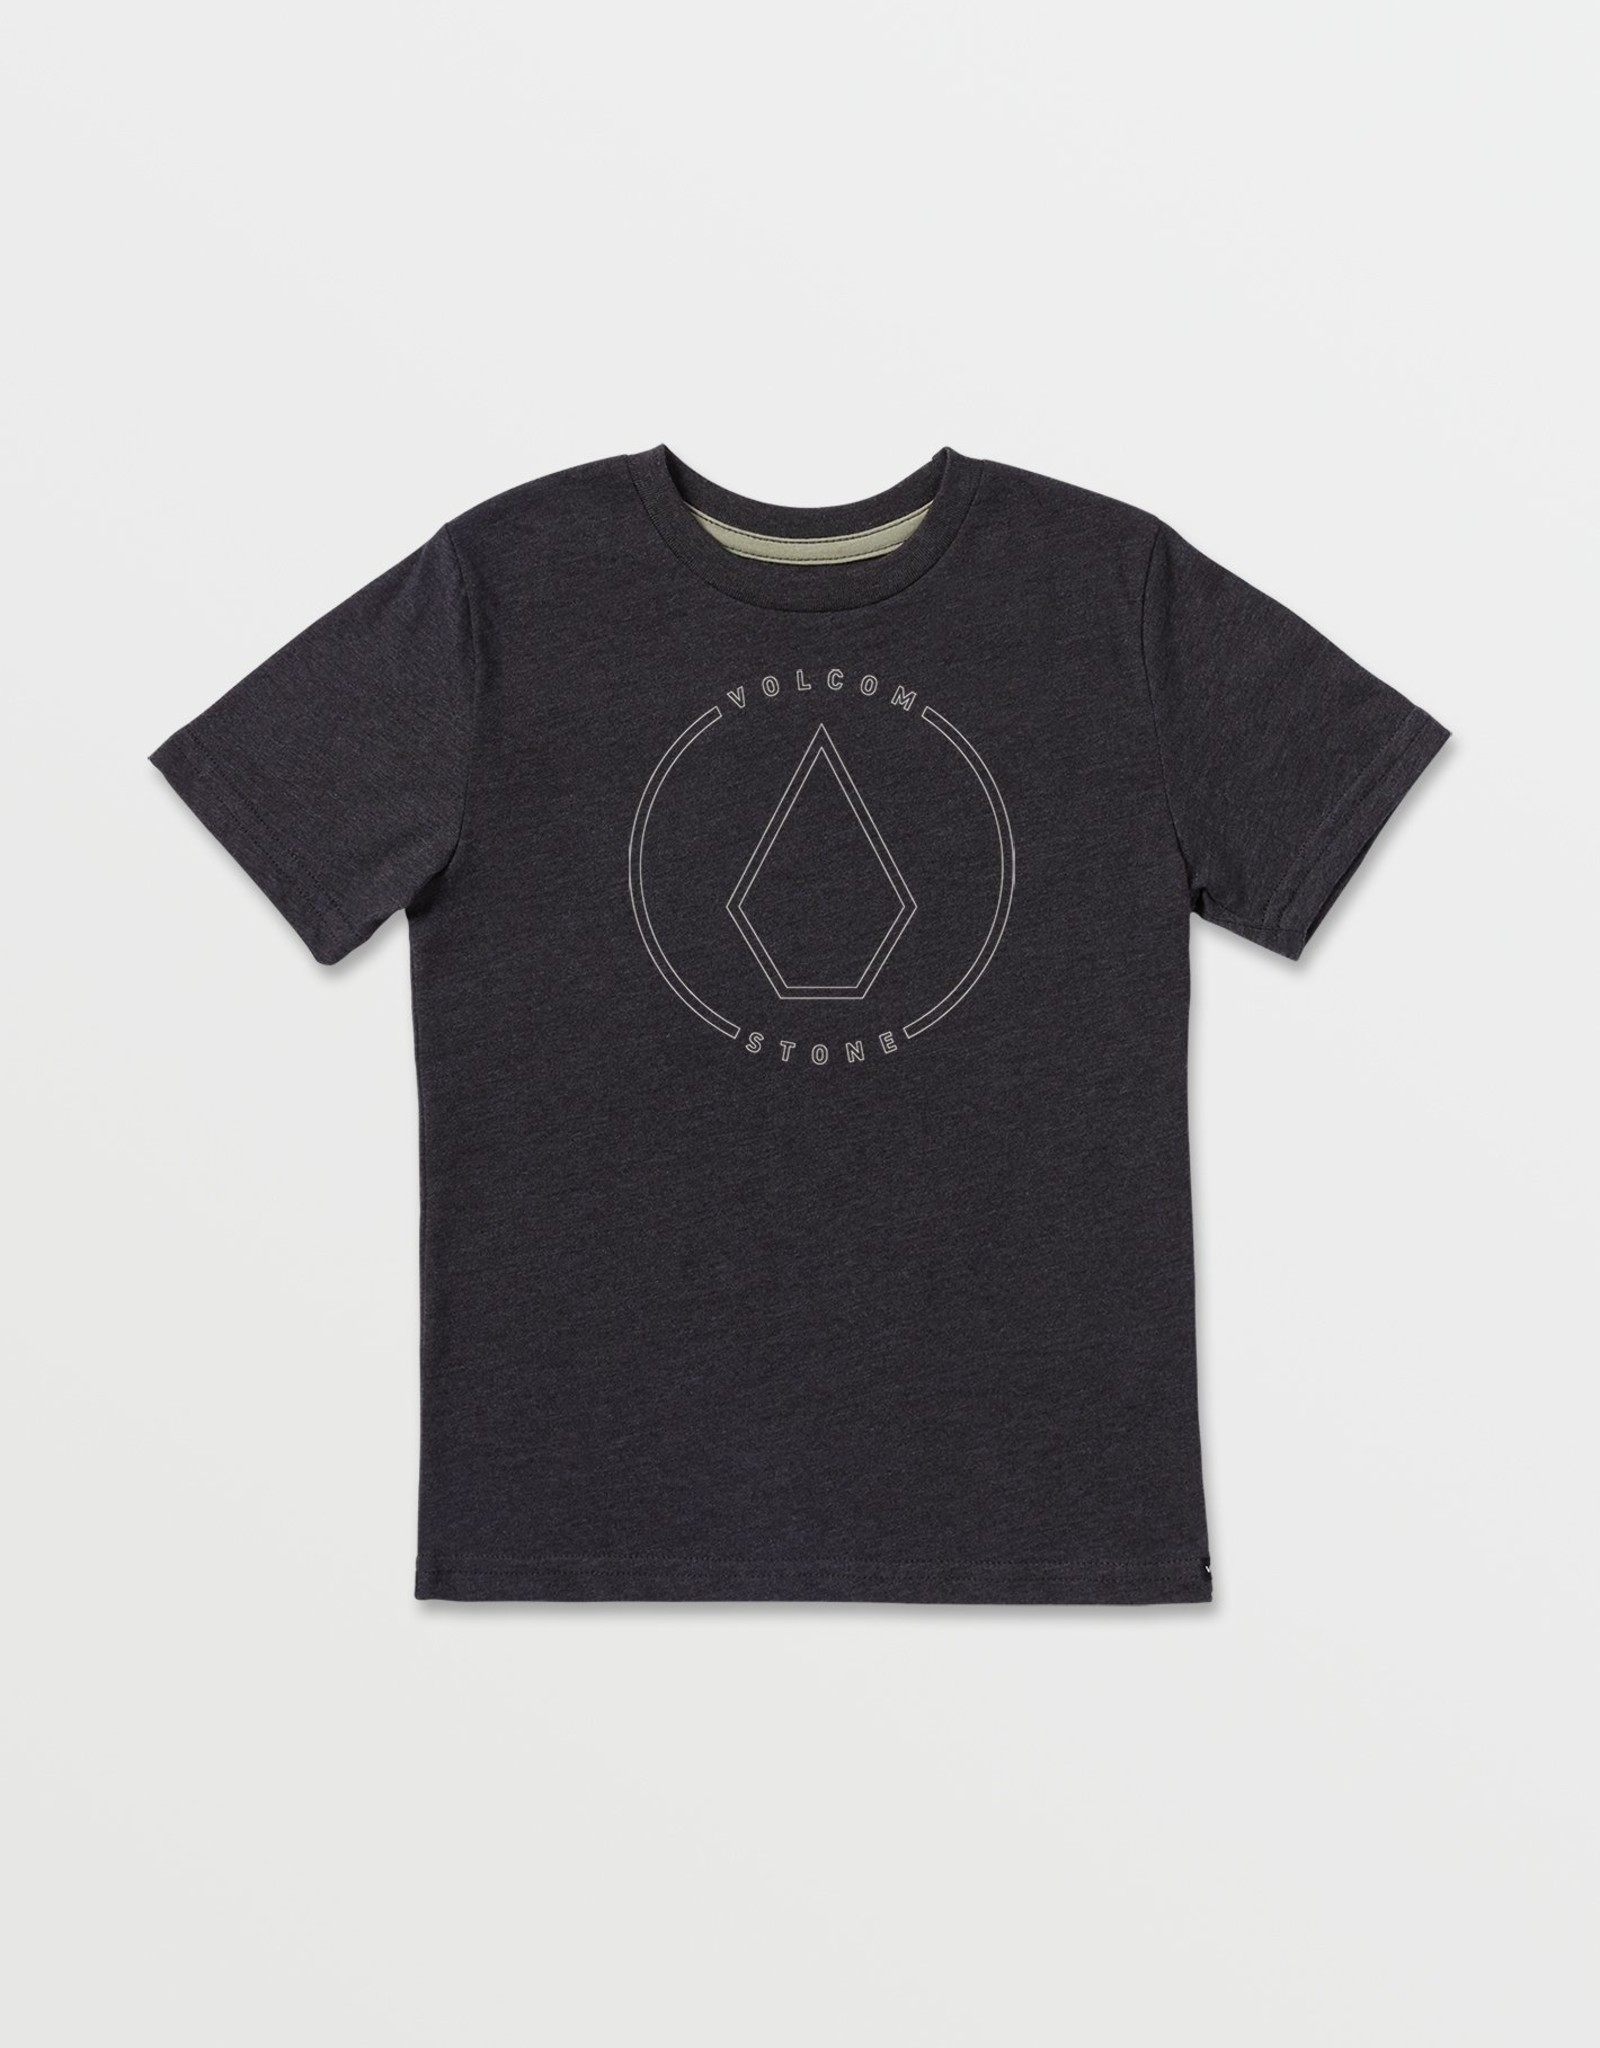 Volcom FA21 Rim Stone T-Shirt